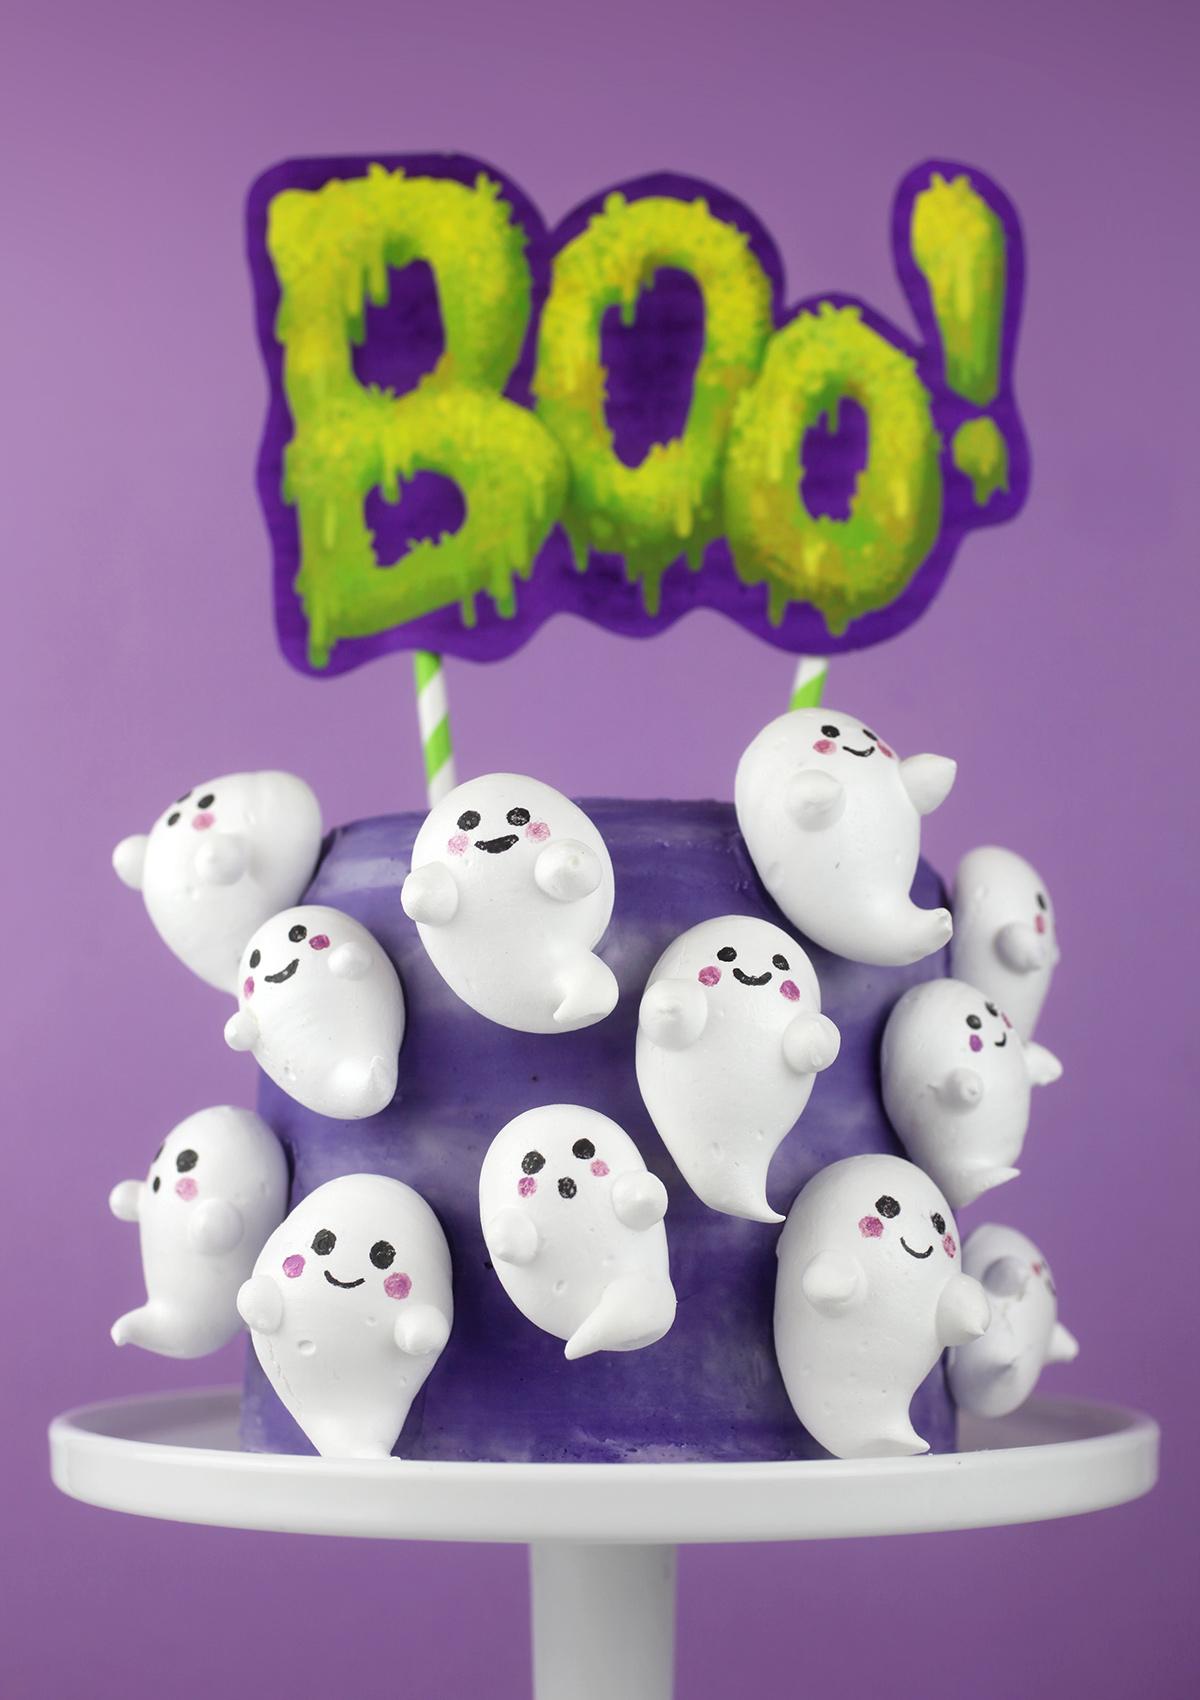 Boo-meringue Cake